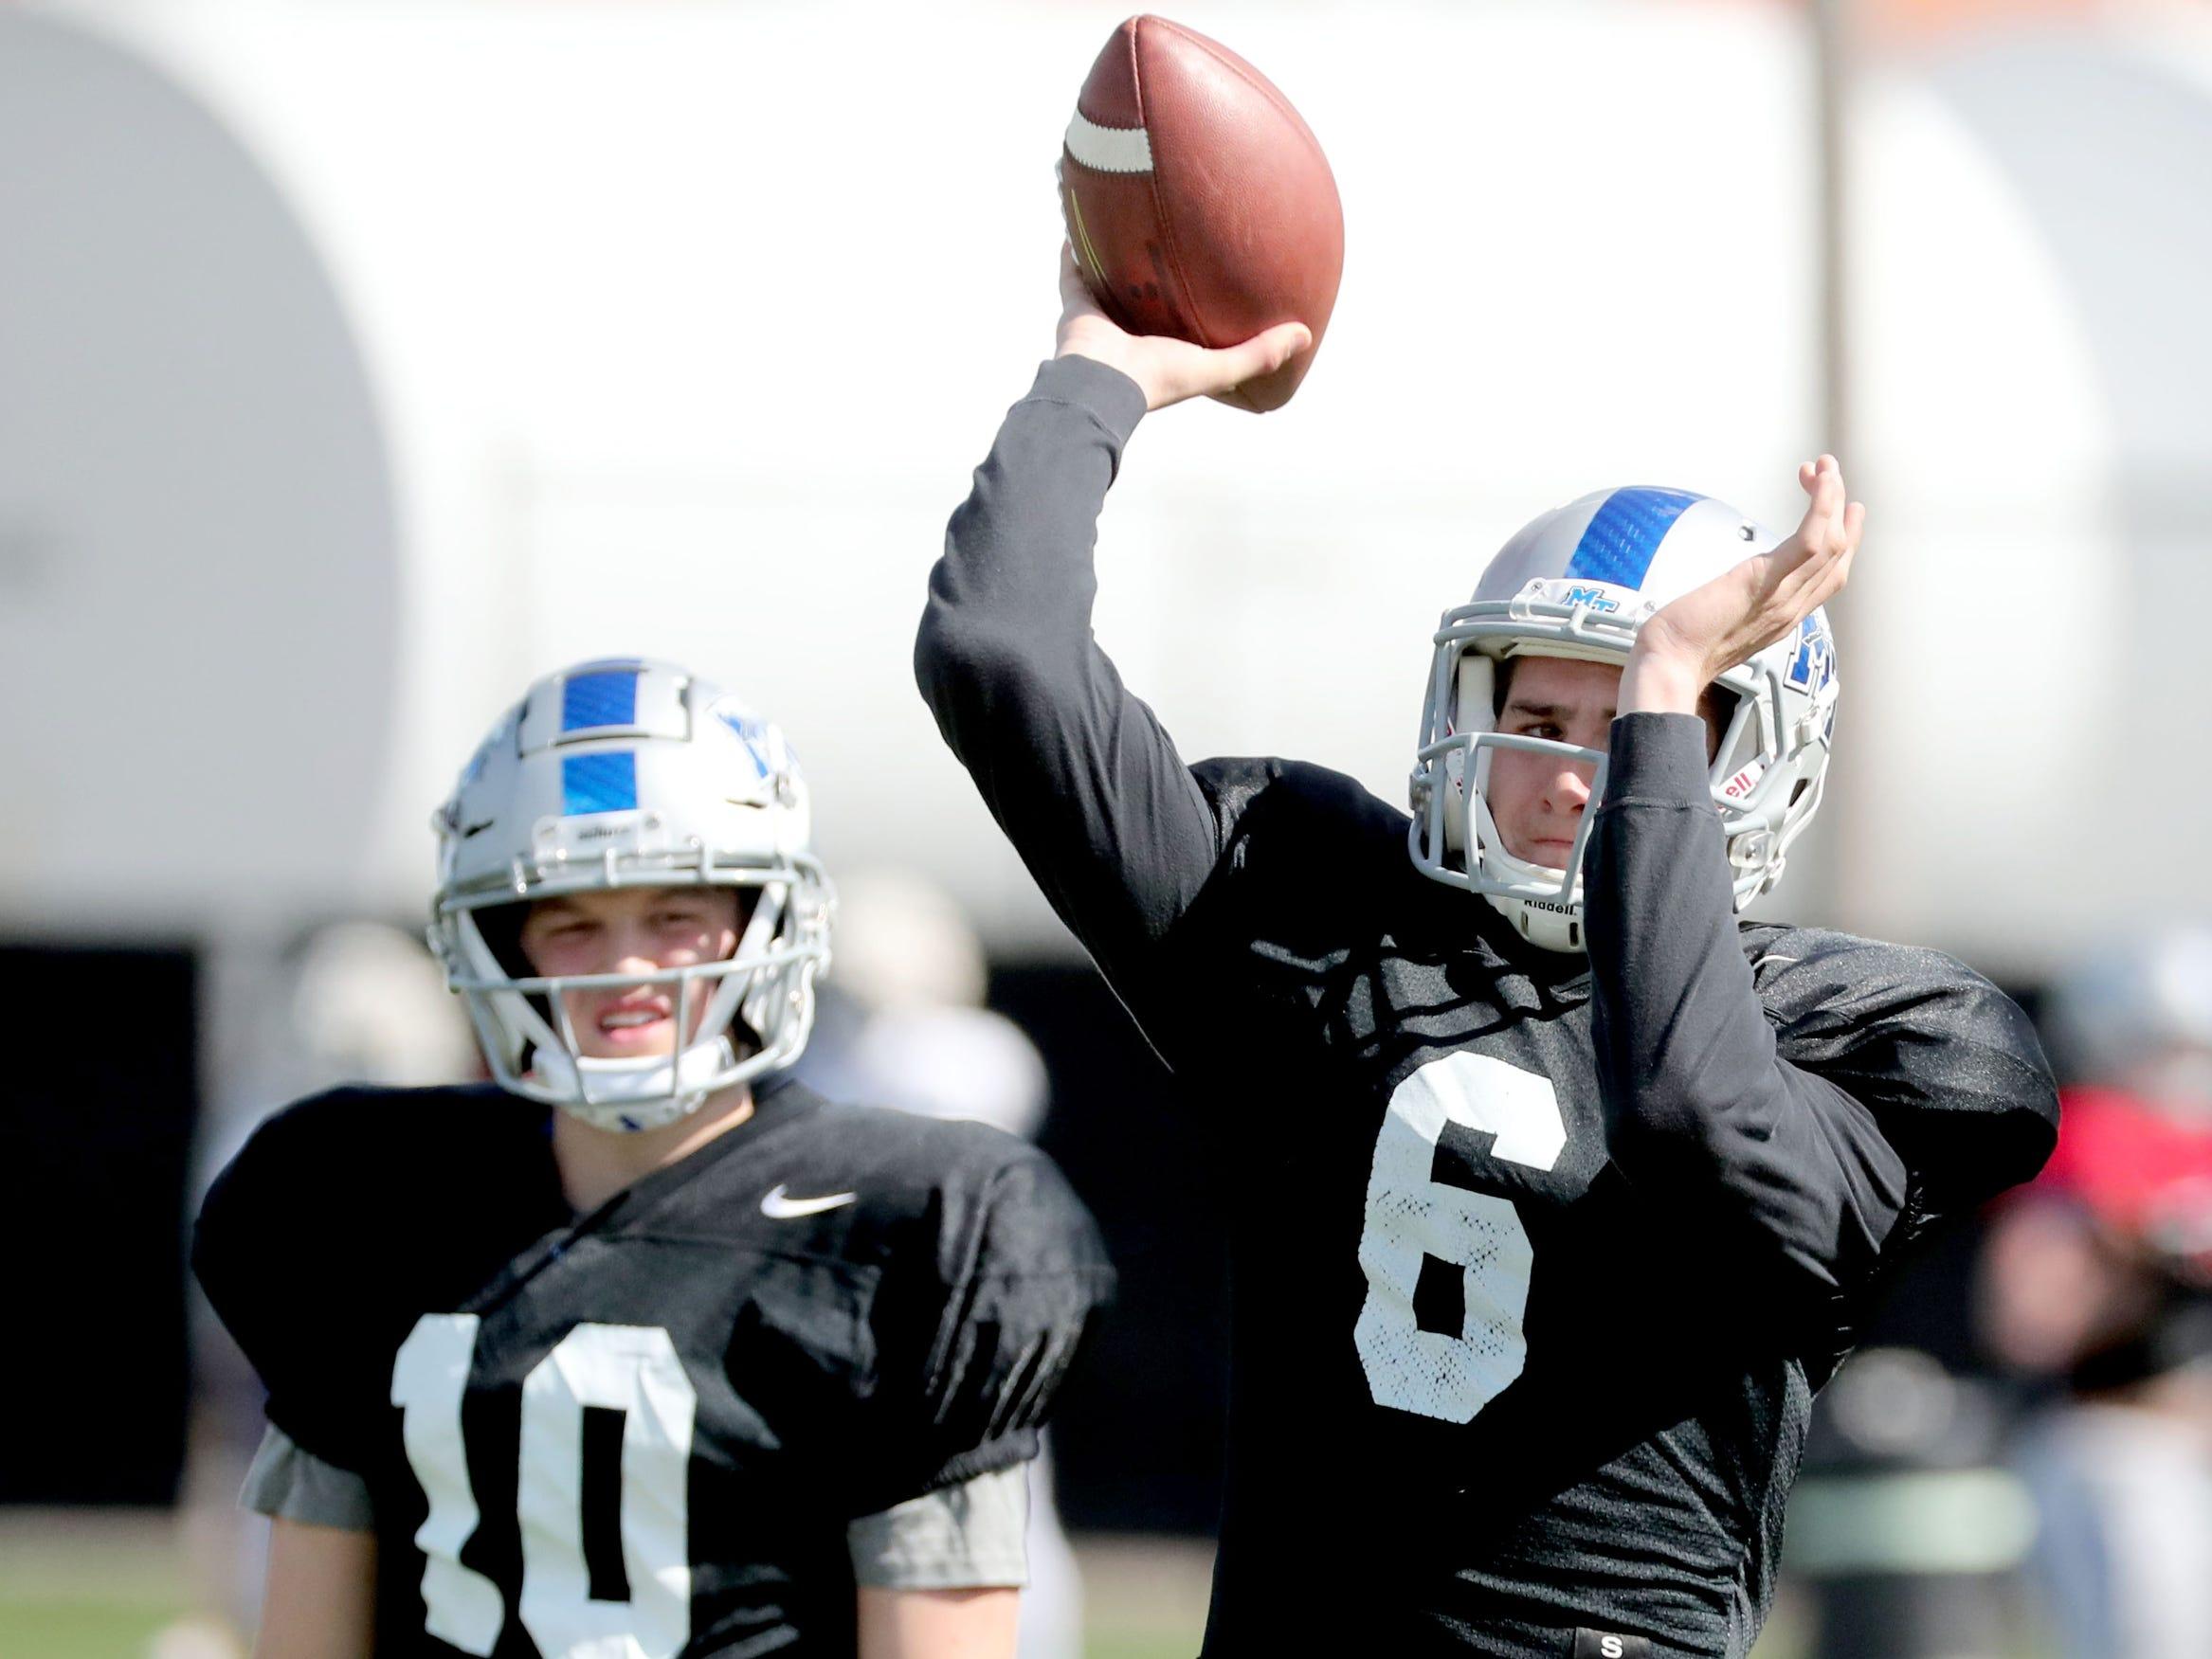 MTSU's quarterback Asher O'Hara (10) watches as MTSU's quarterback Chance Nolan (6) passes the ball during MTSU's football practice, in Murfreesboro on Tuesday April 9, 2019.